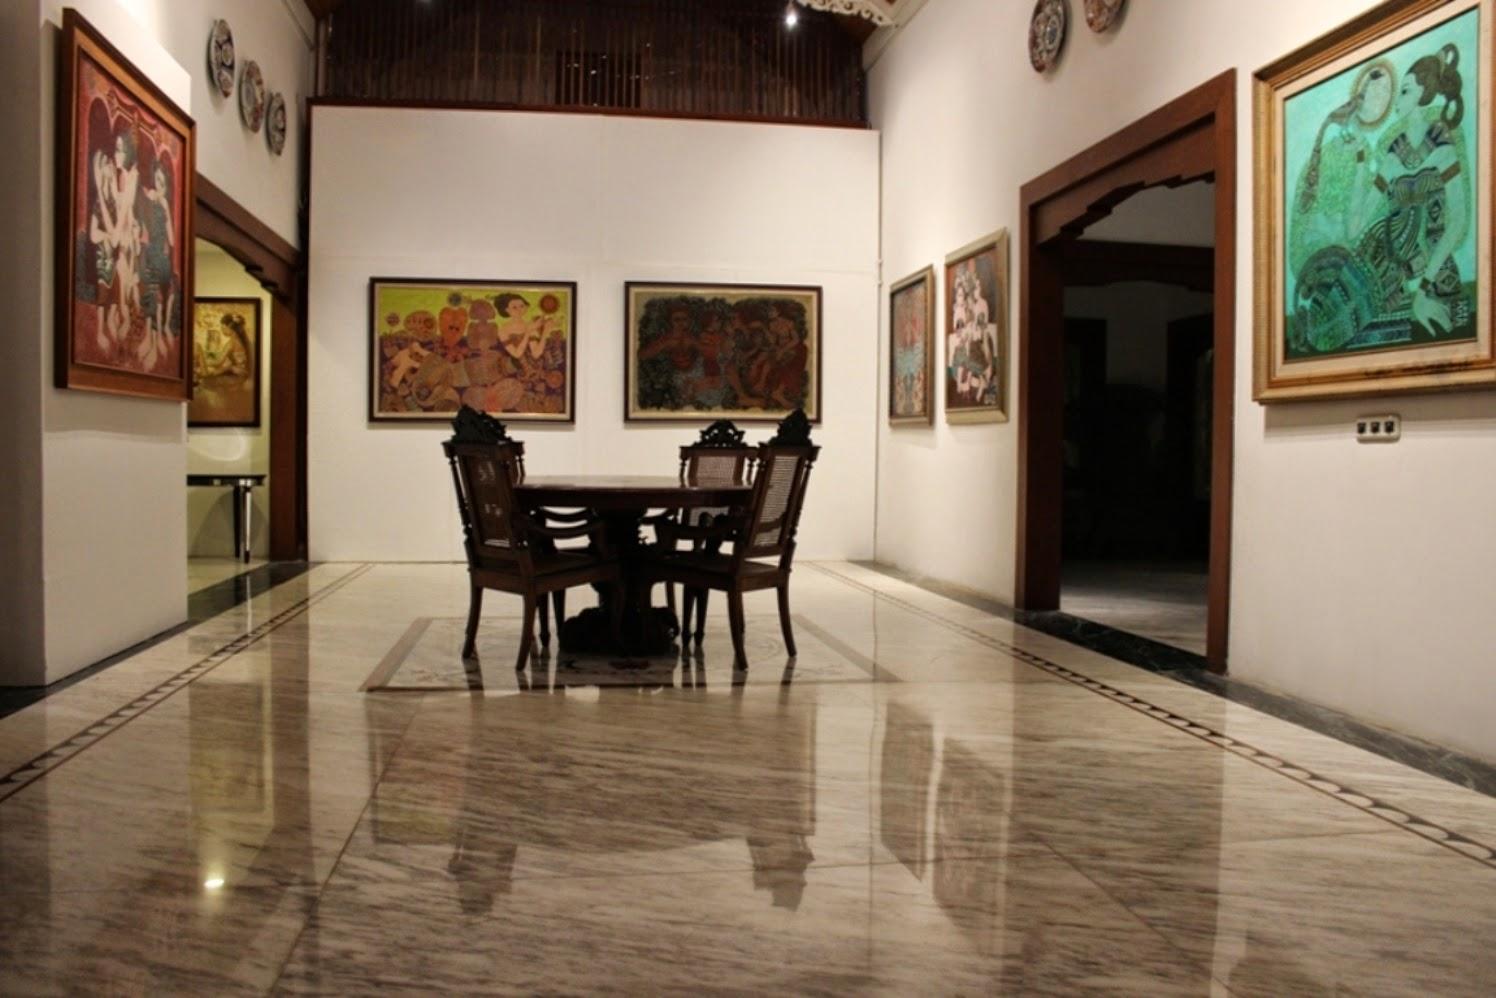 Painting exhibition (Hasan Djaafar,Irsam,Suroso,Otto Djaya)